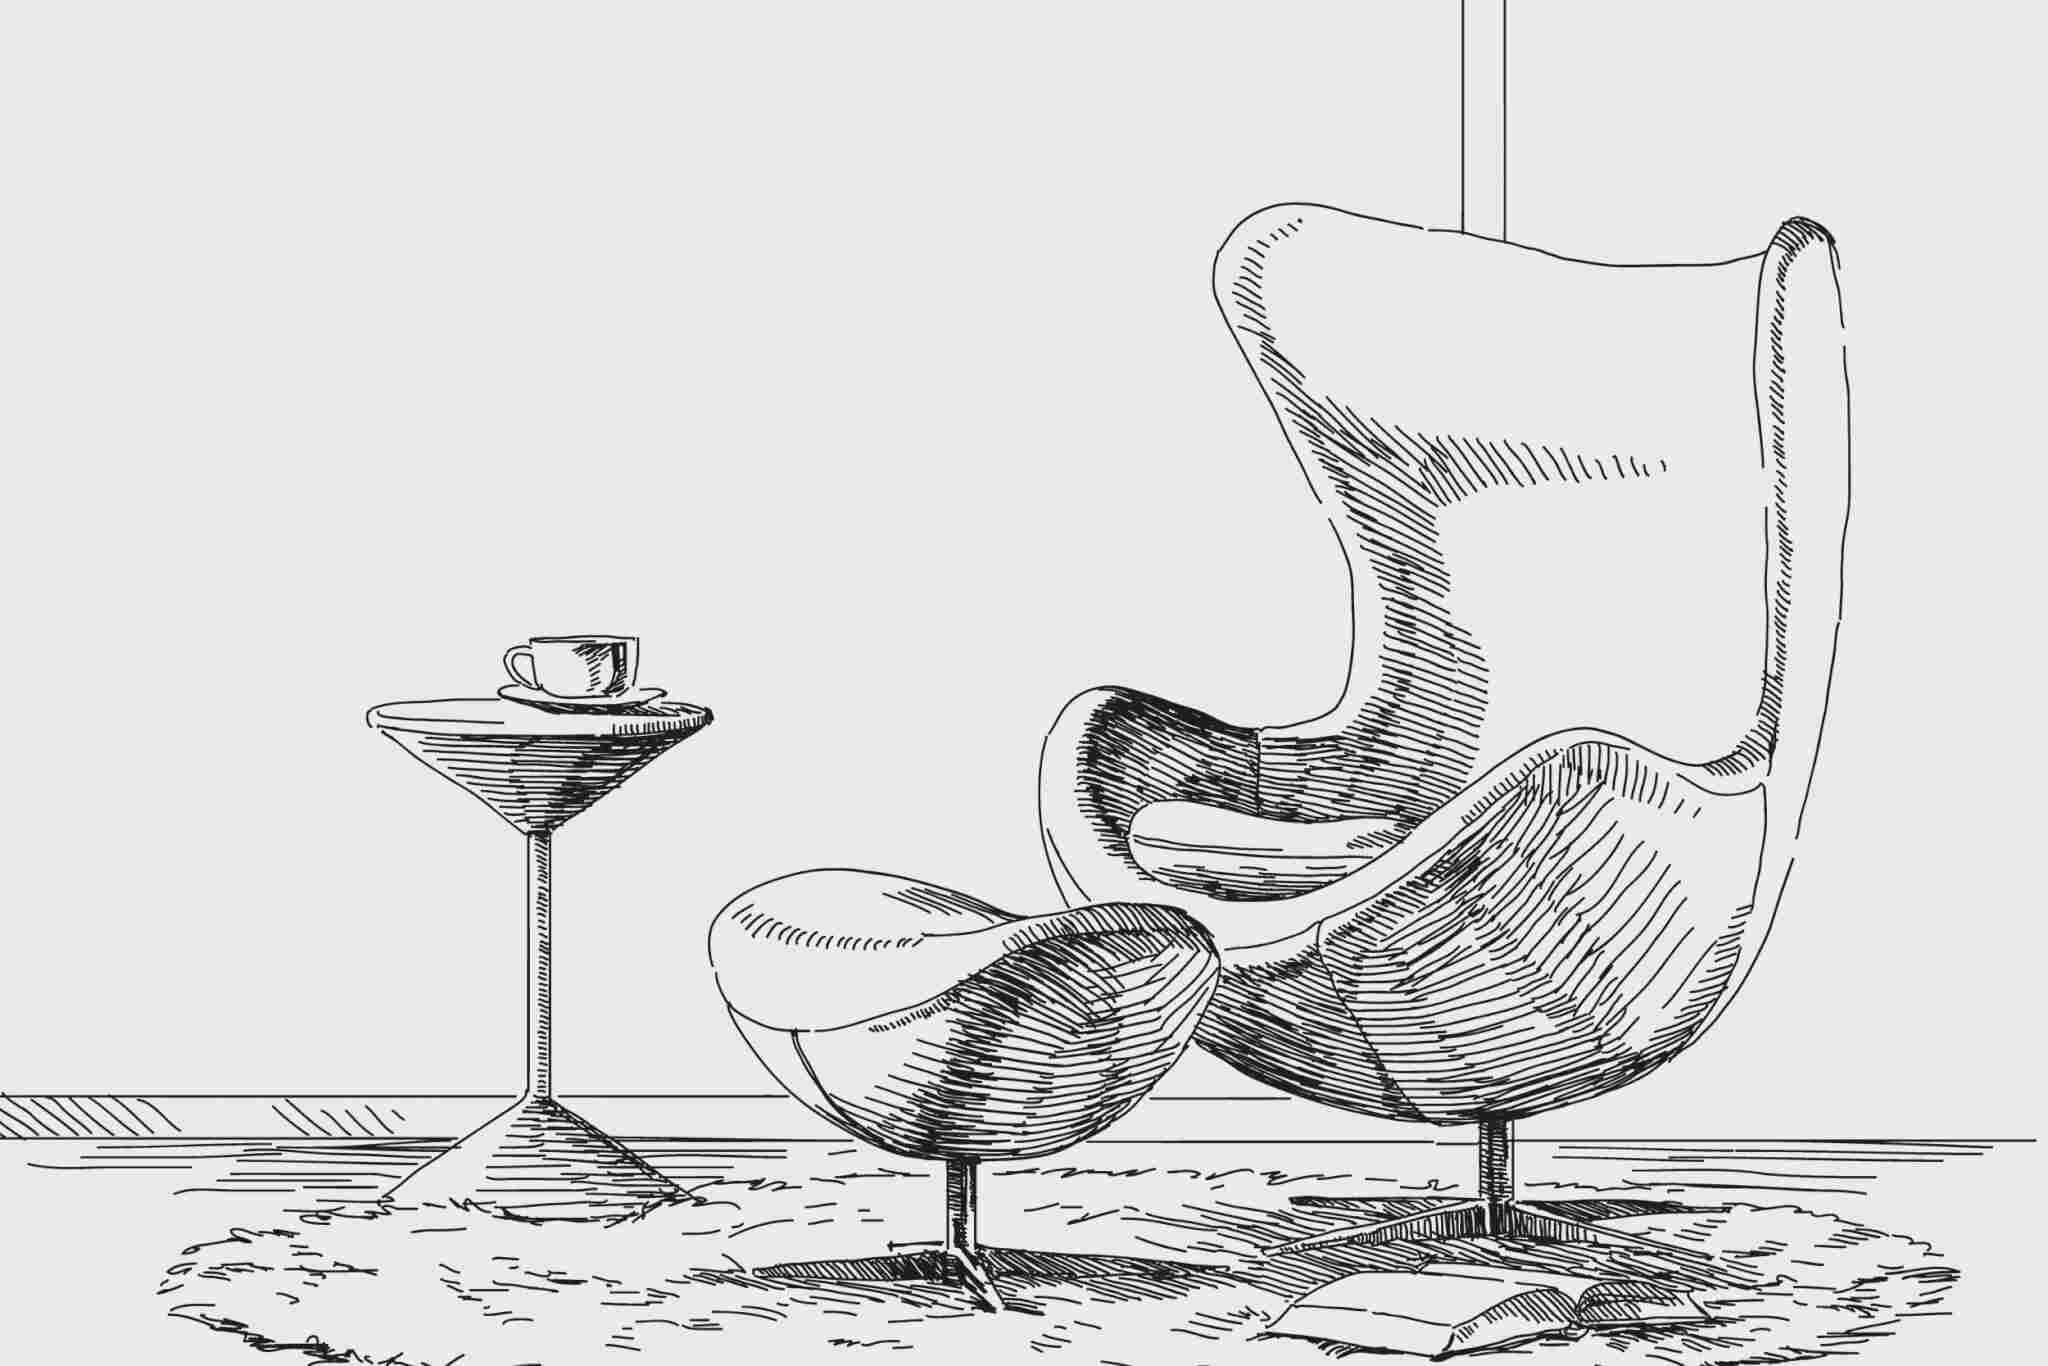 https://akldecor.com/wp-content/uploads/2017/05/image-lined-chair.jpg